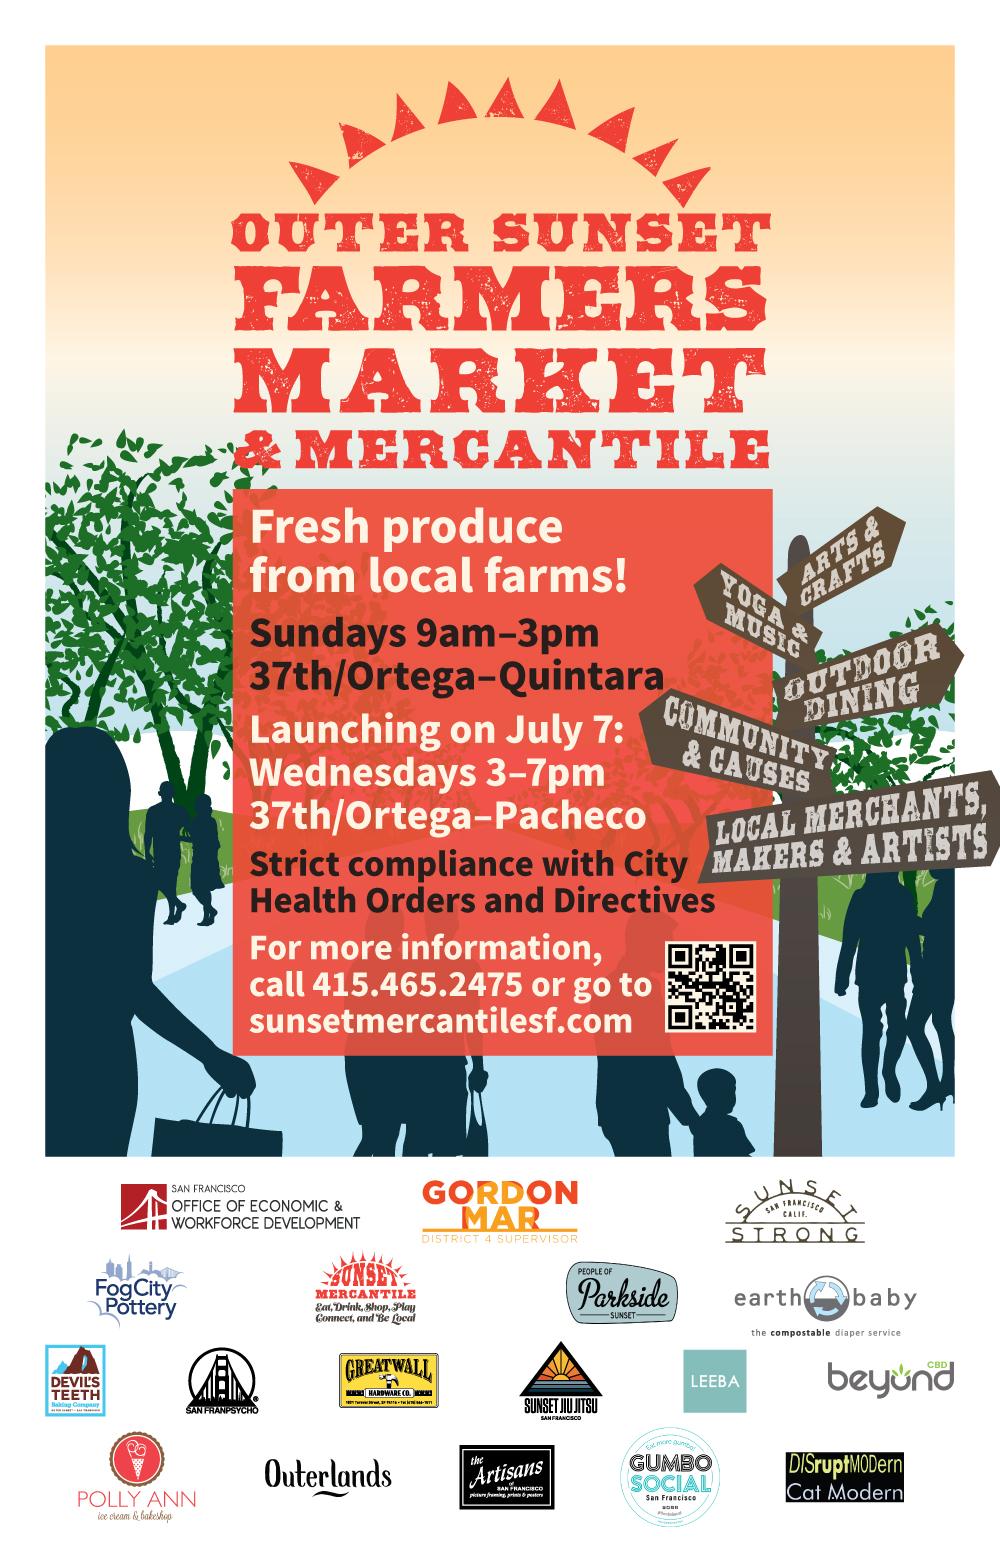 Outer Sunset Farmers Market & Mercantile 外日落区农夫市场及工艺坊